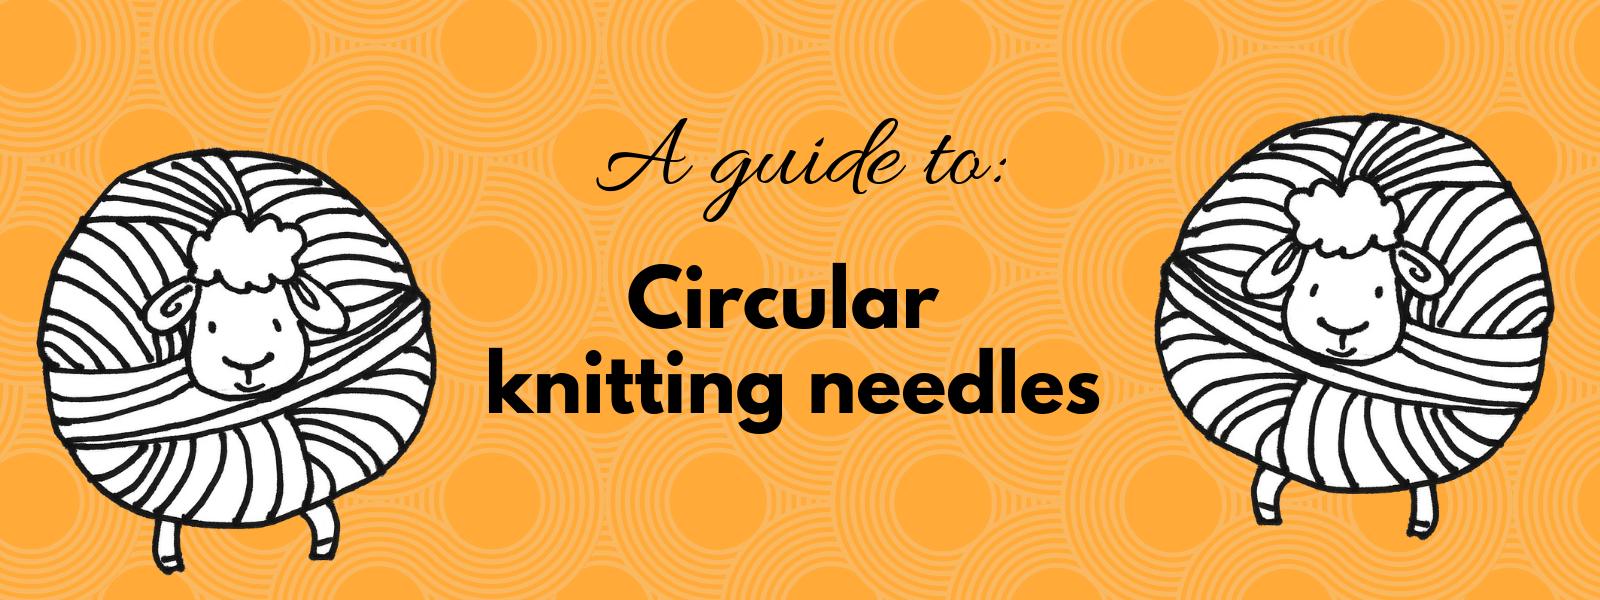 Circular knitting needles for beginners